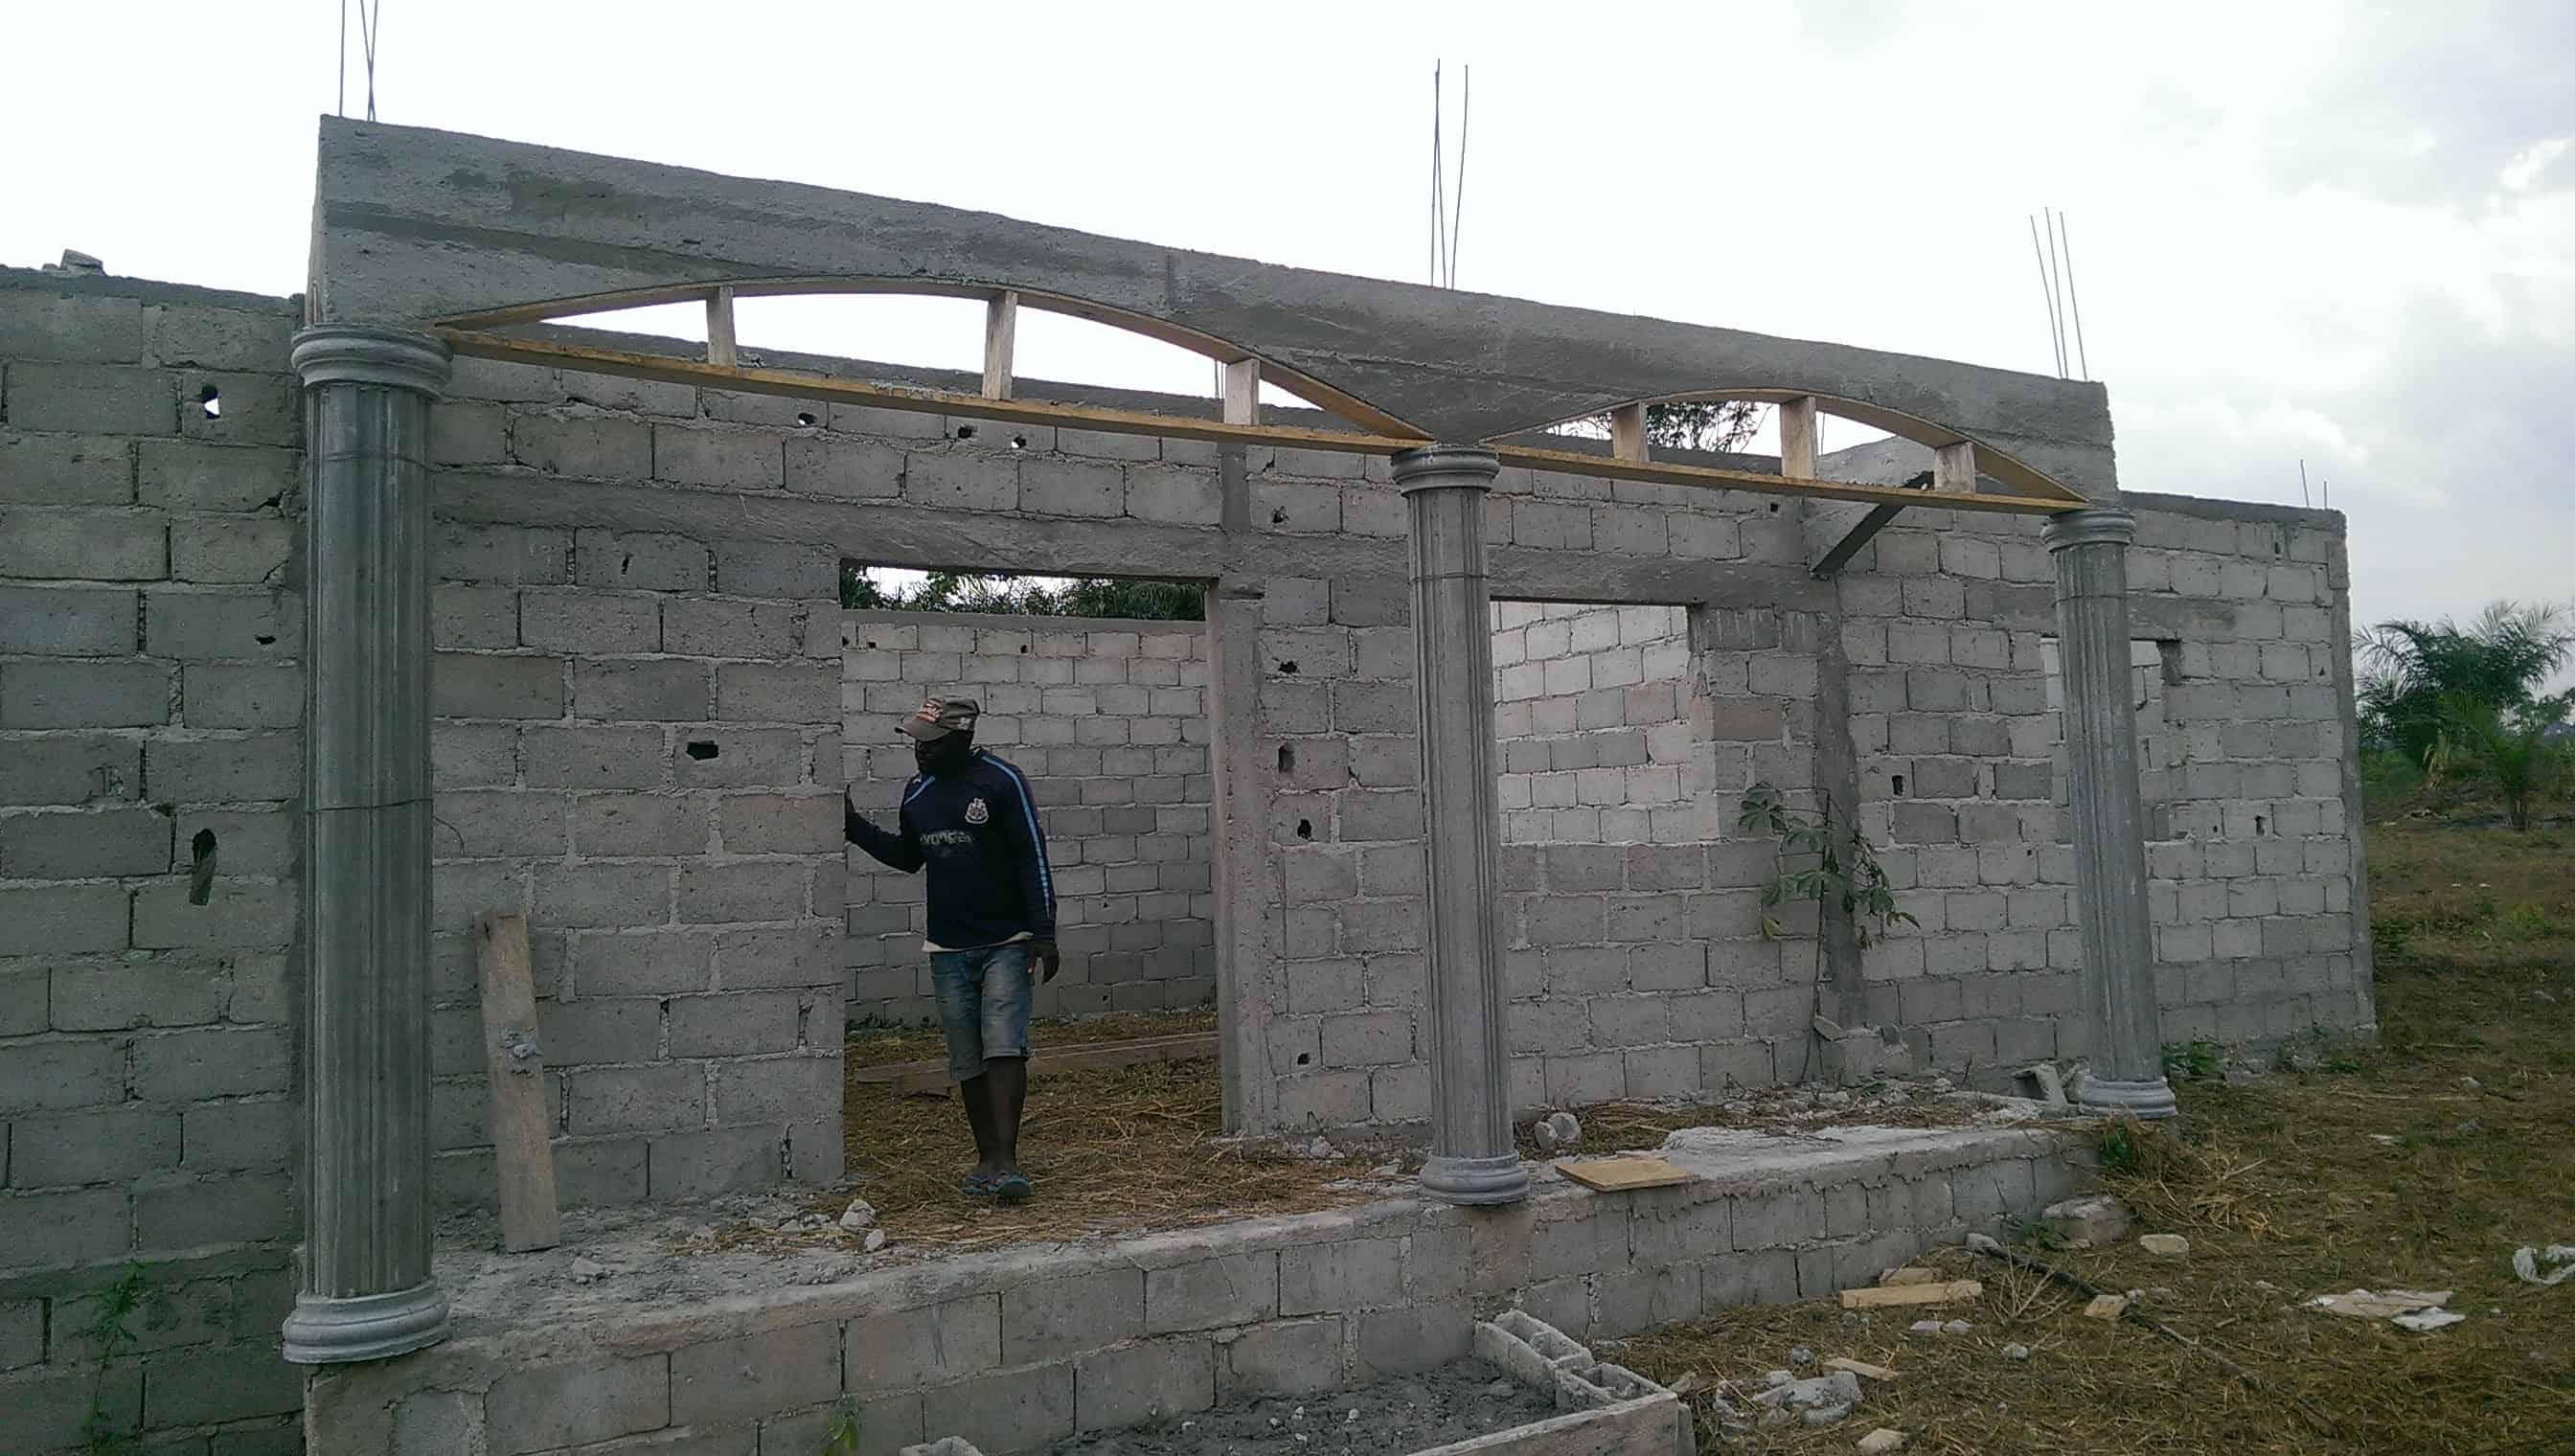 Land for sale at Yaoundé, Mfou, kye ossi, ville frontalier cameroun - gabon - guinee equatoriale - 3200 m2 - 8 000 000 FCFA